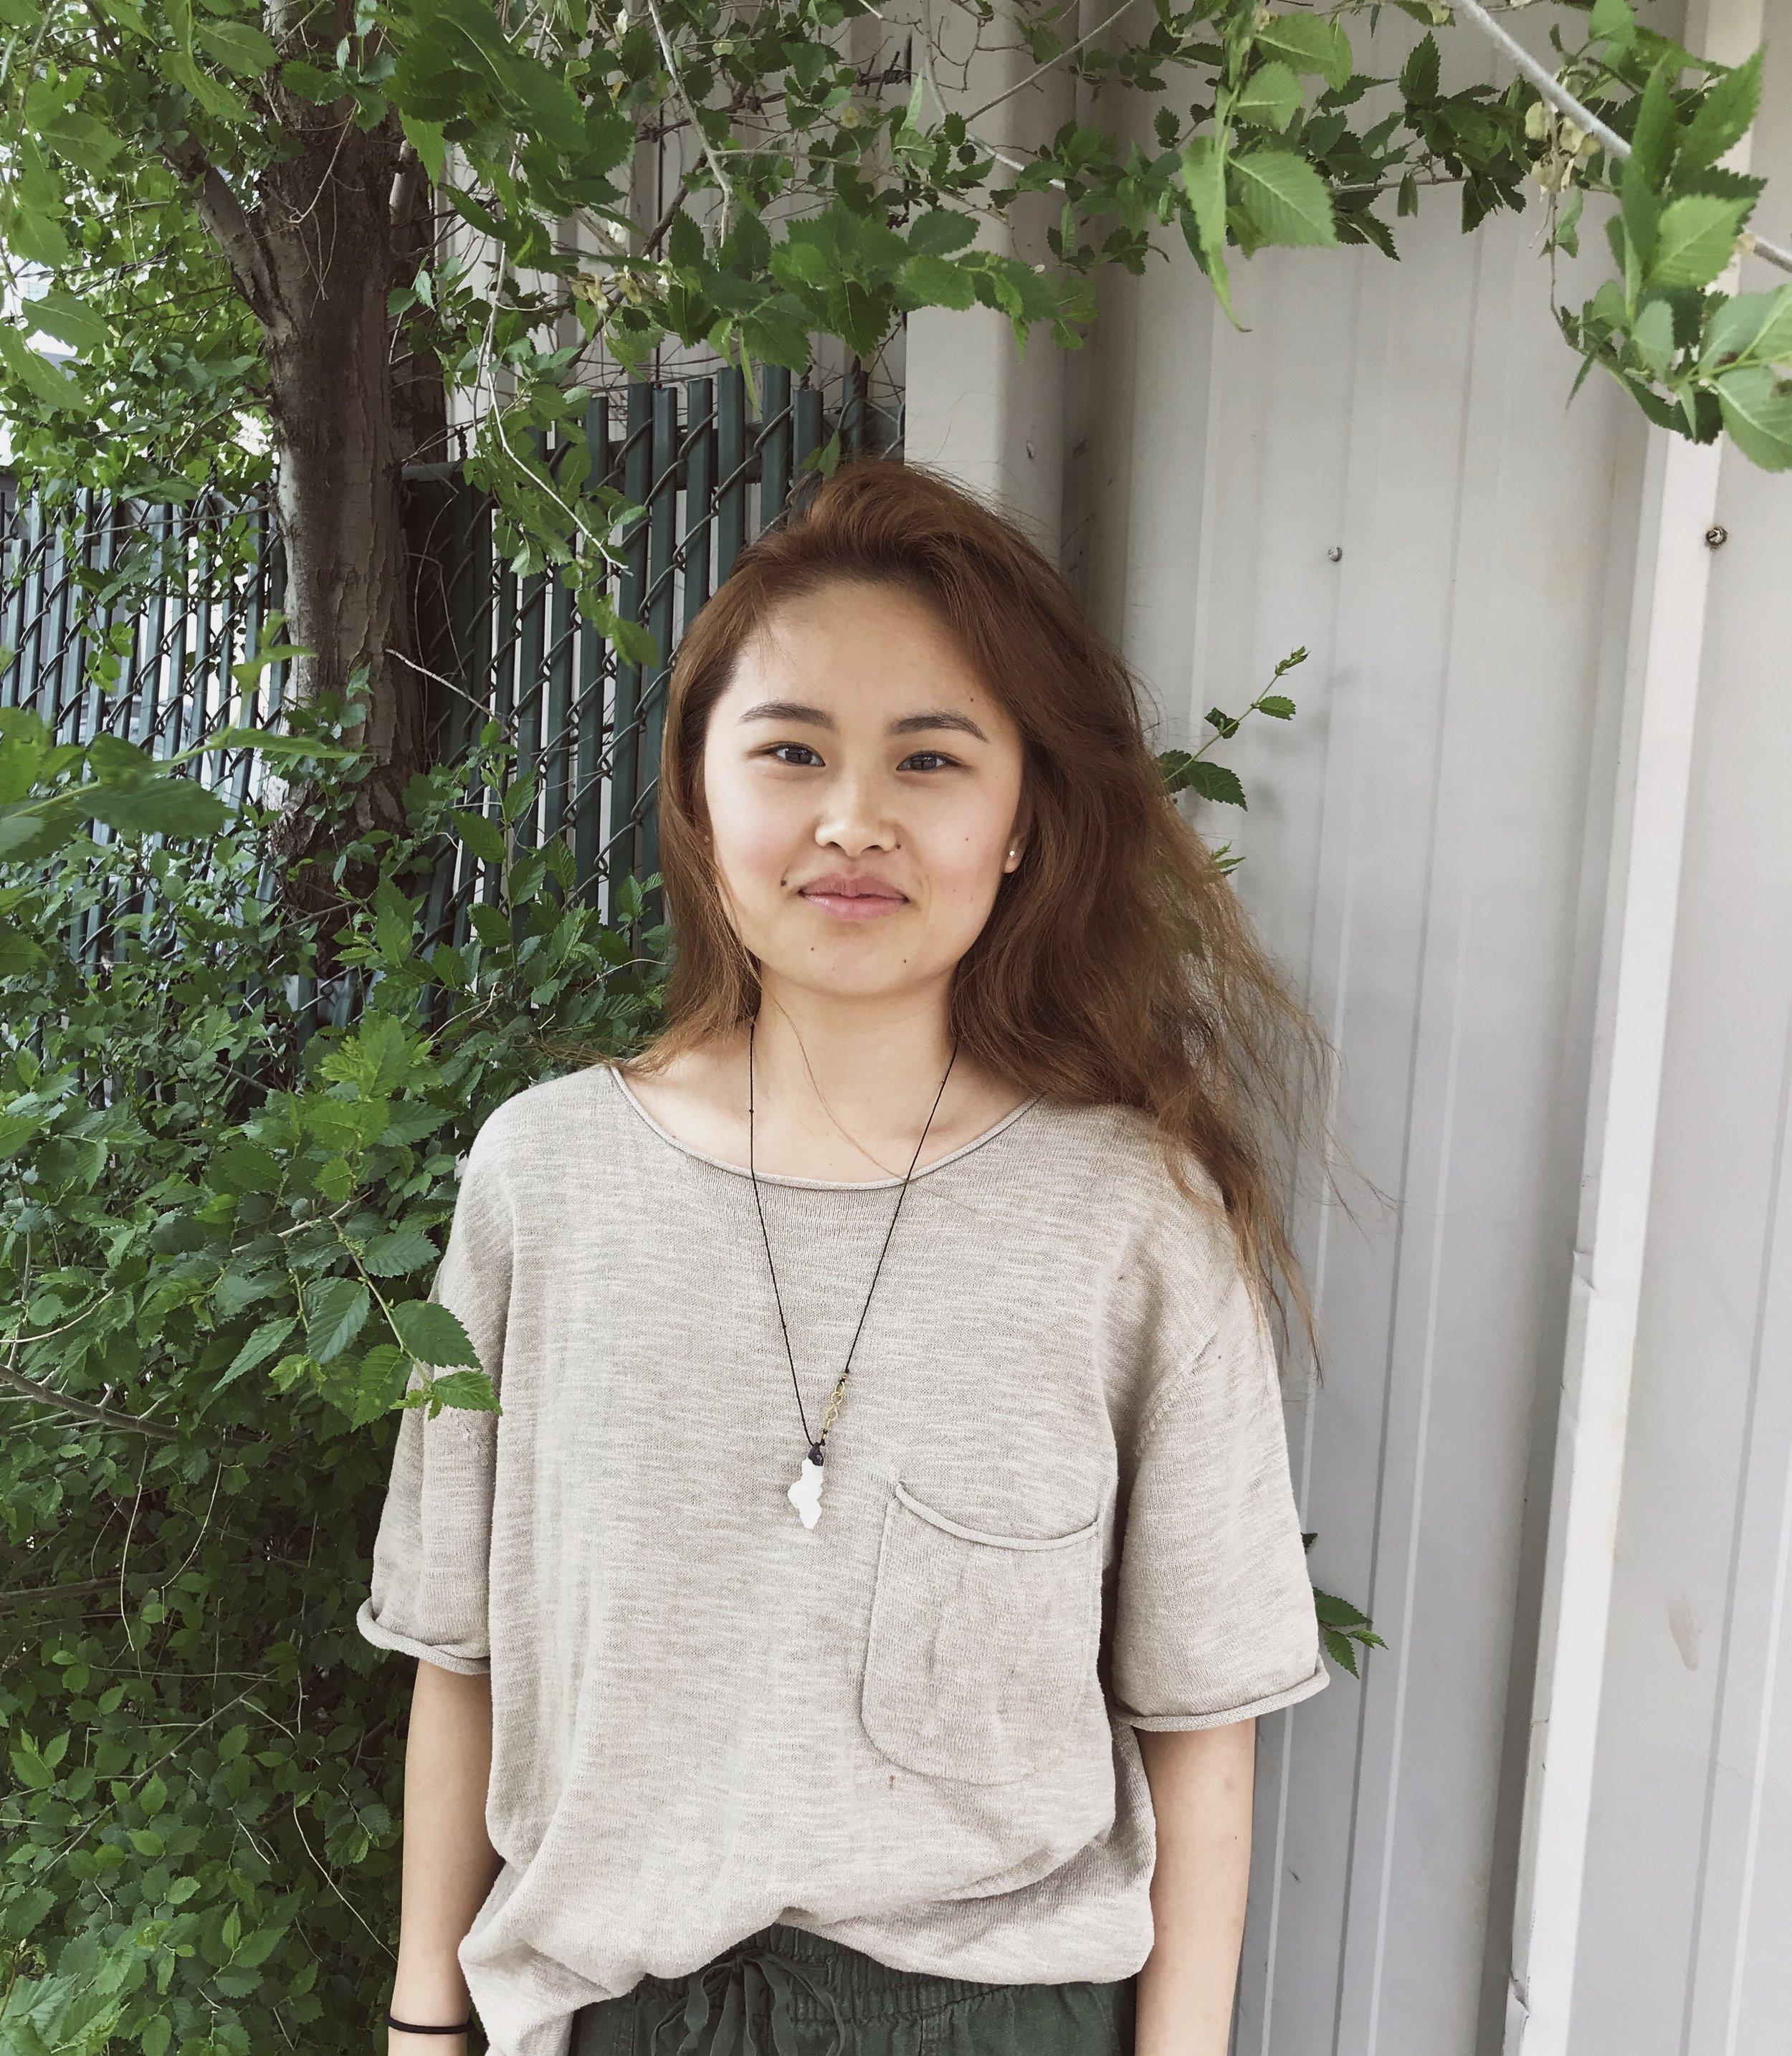 COMPAS summer intern Melissa Moua